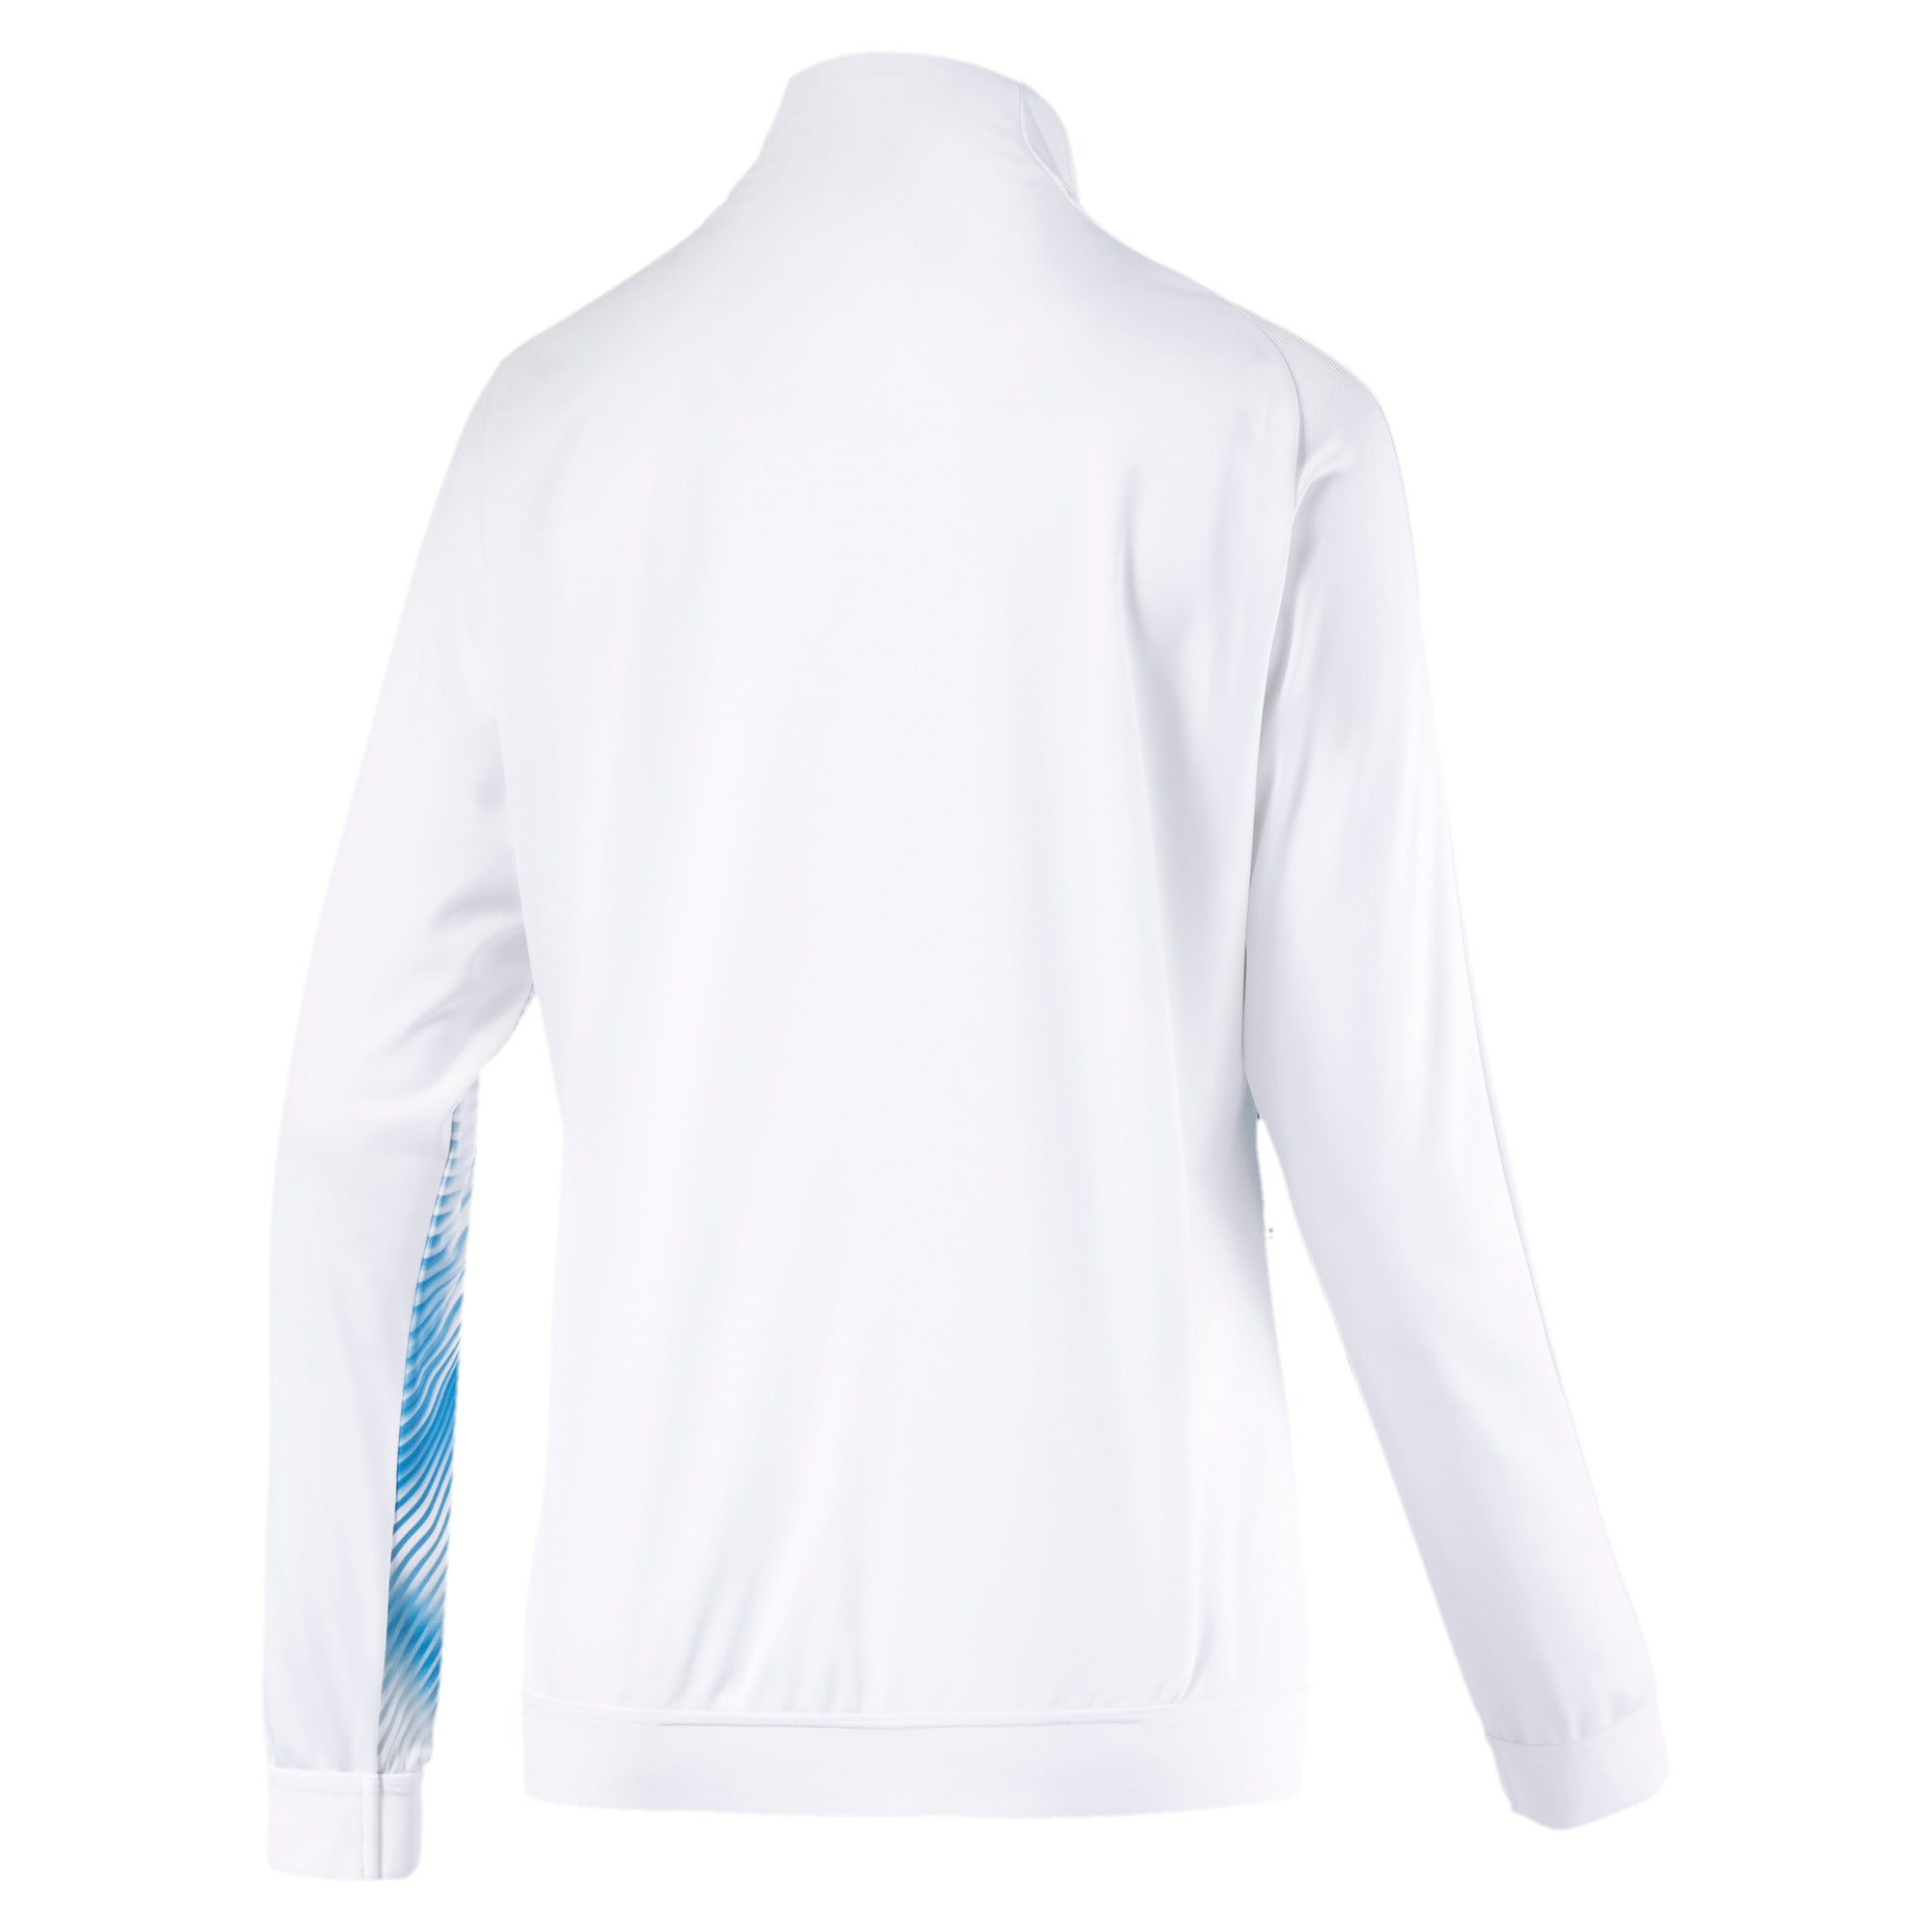 Thumbnail 2 of Olympique de Marseille Stadium Women's Replica Jacket, Puma White-Bleu Azur, medium